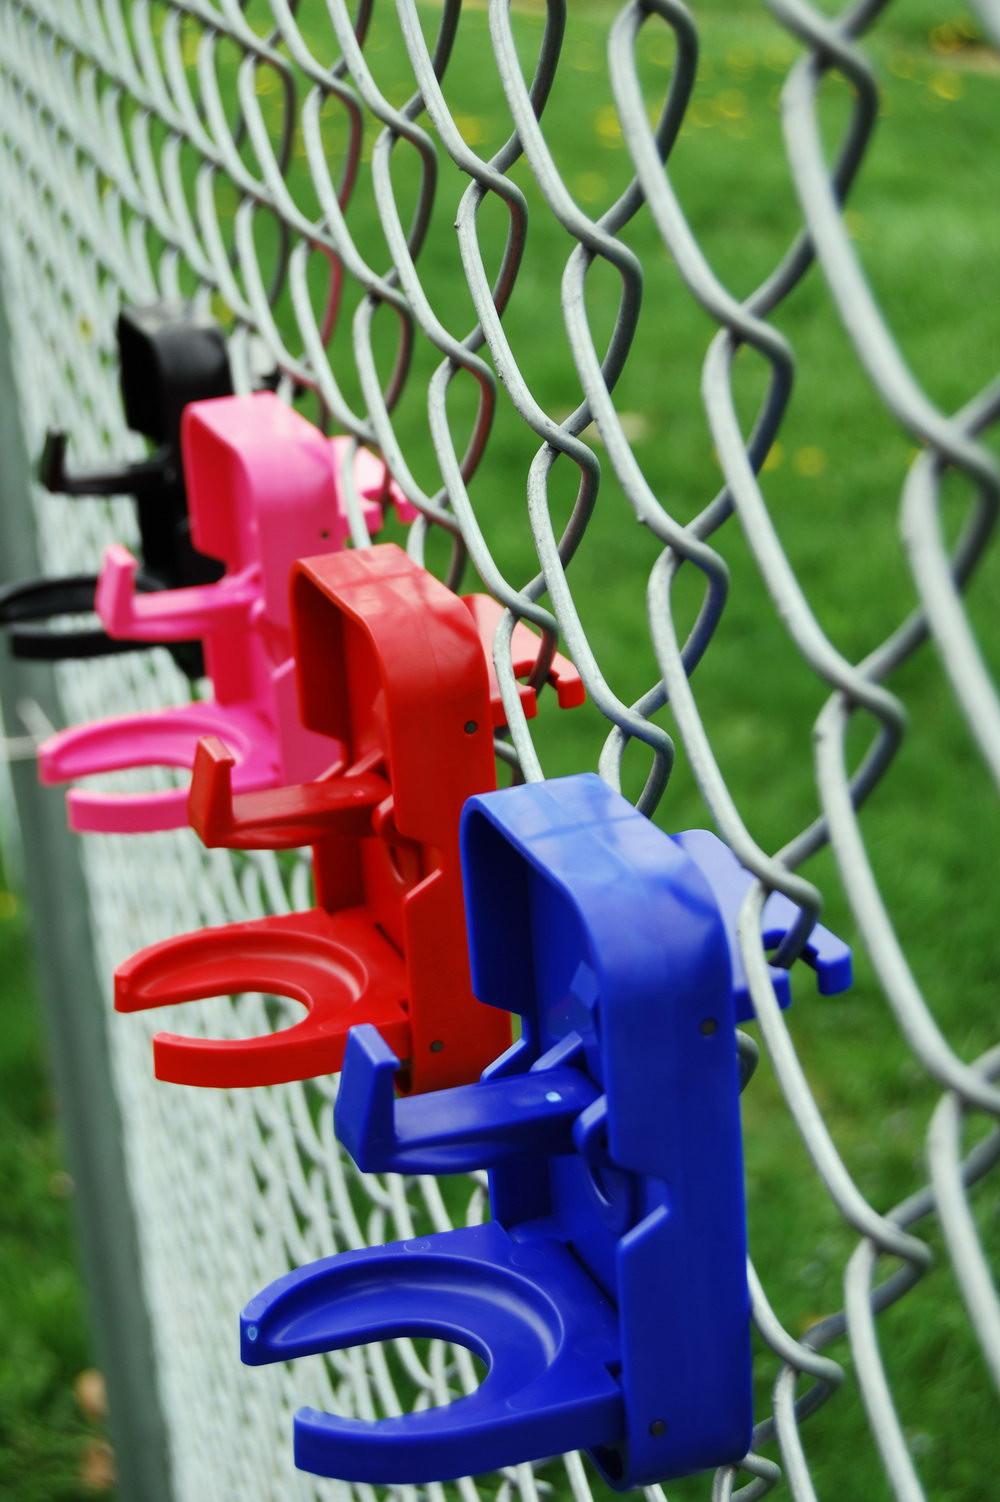 Best ideas about DIY Dugout Organizer . Save or Pin Baseball Cap Storage Organizer Now.